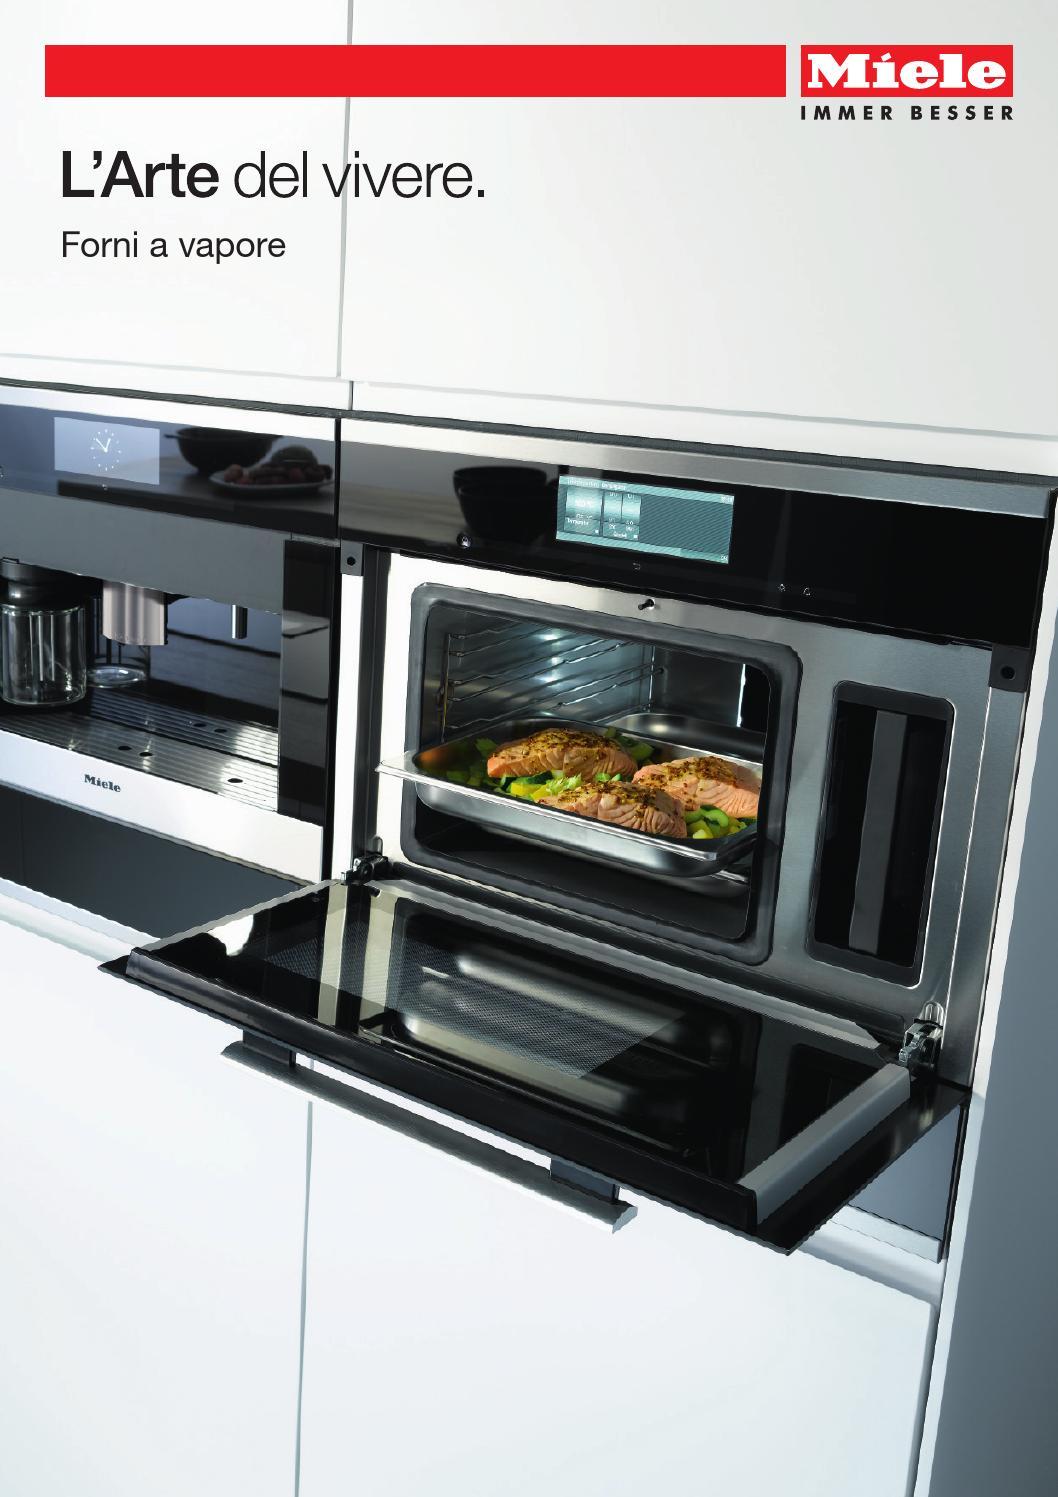 Miele catalogo forni a vapore i by miele issuu - Forno con cottura a vapore ...